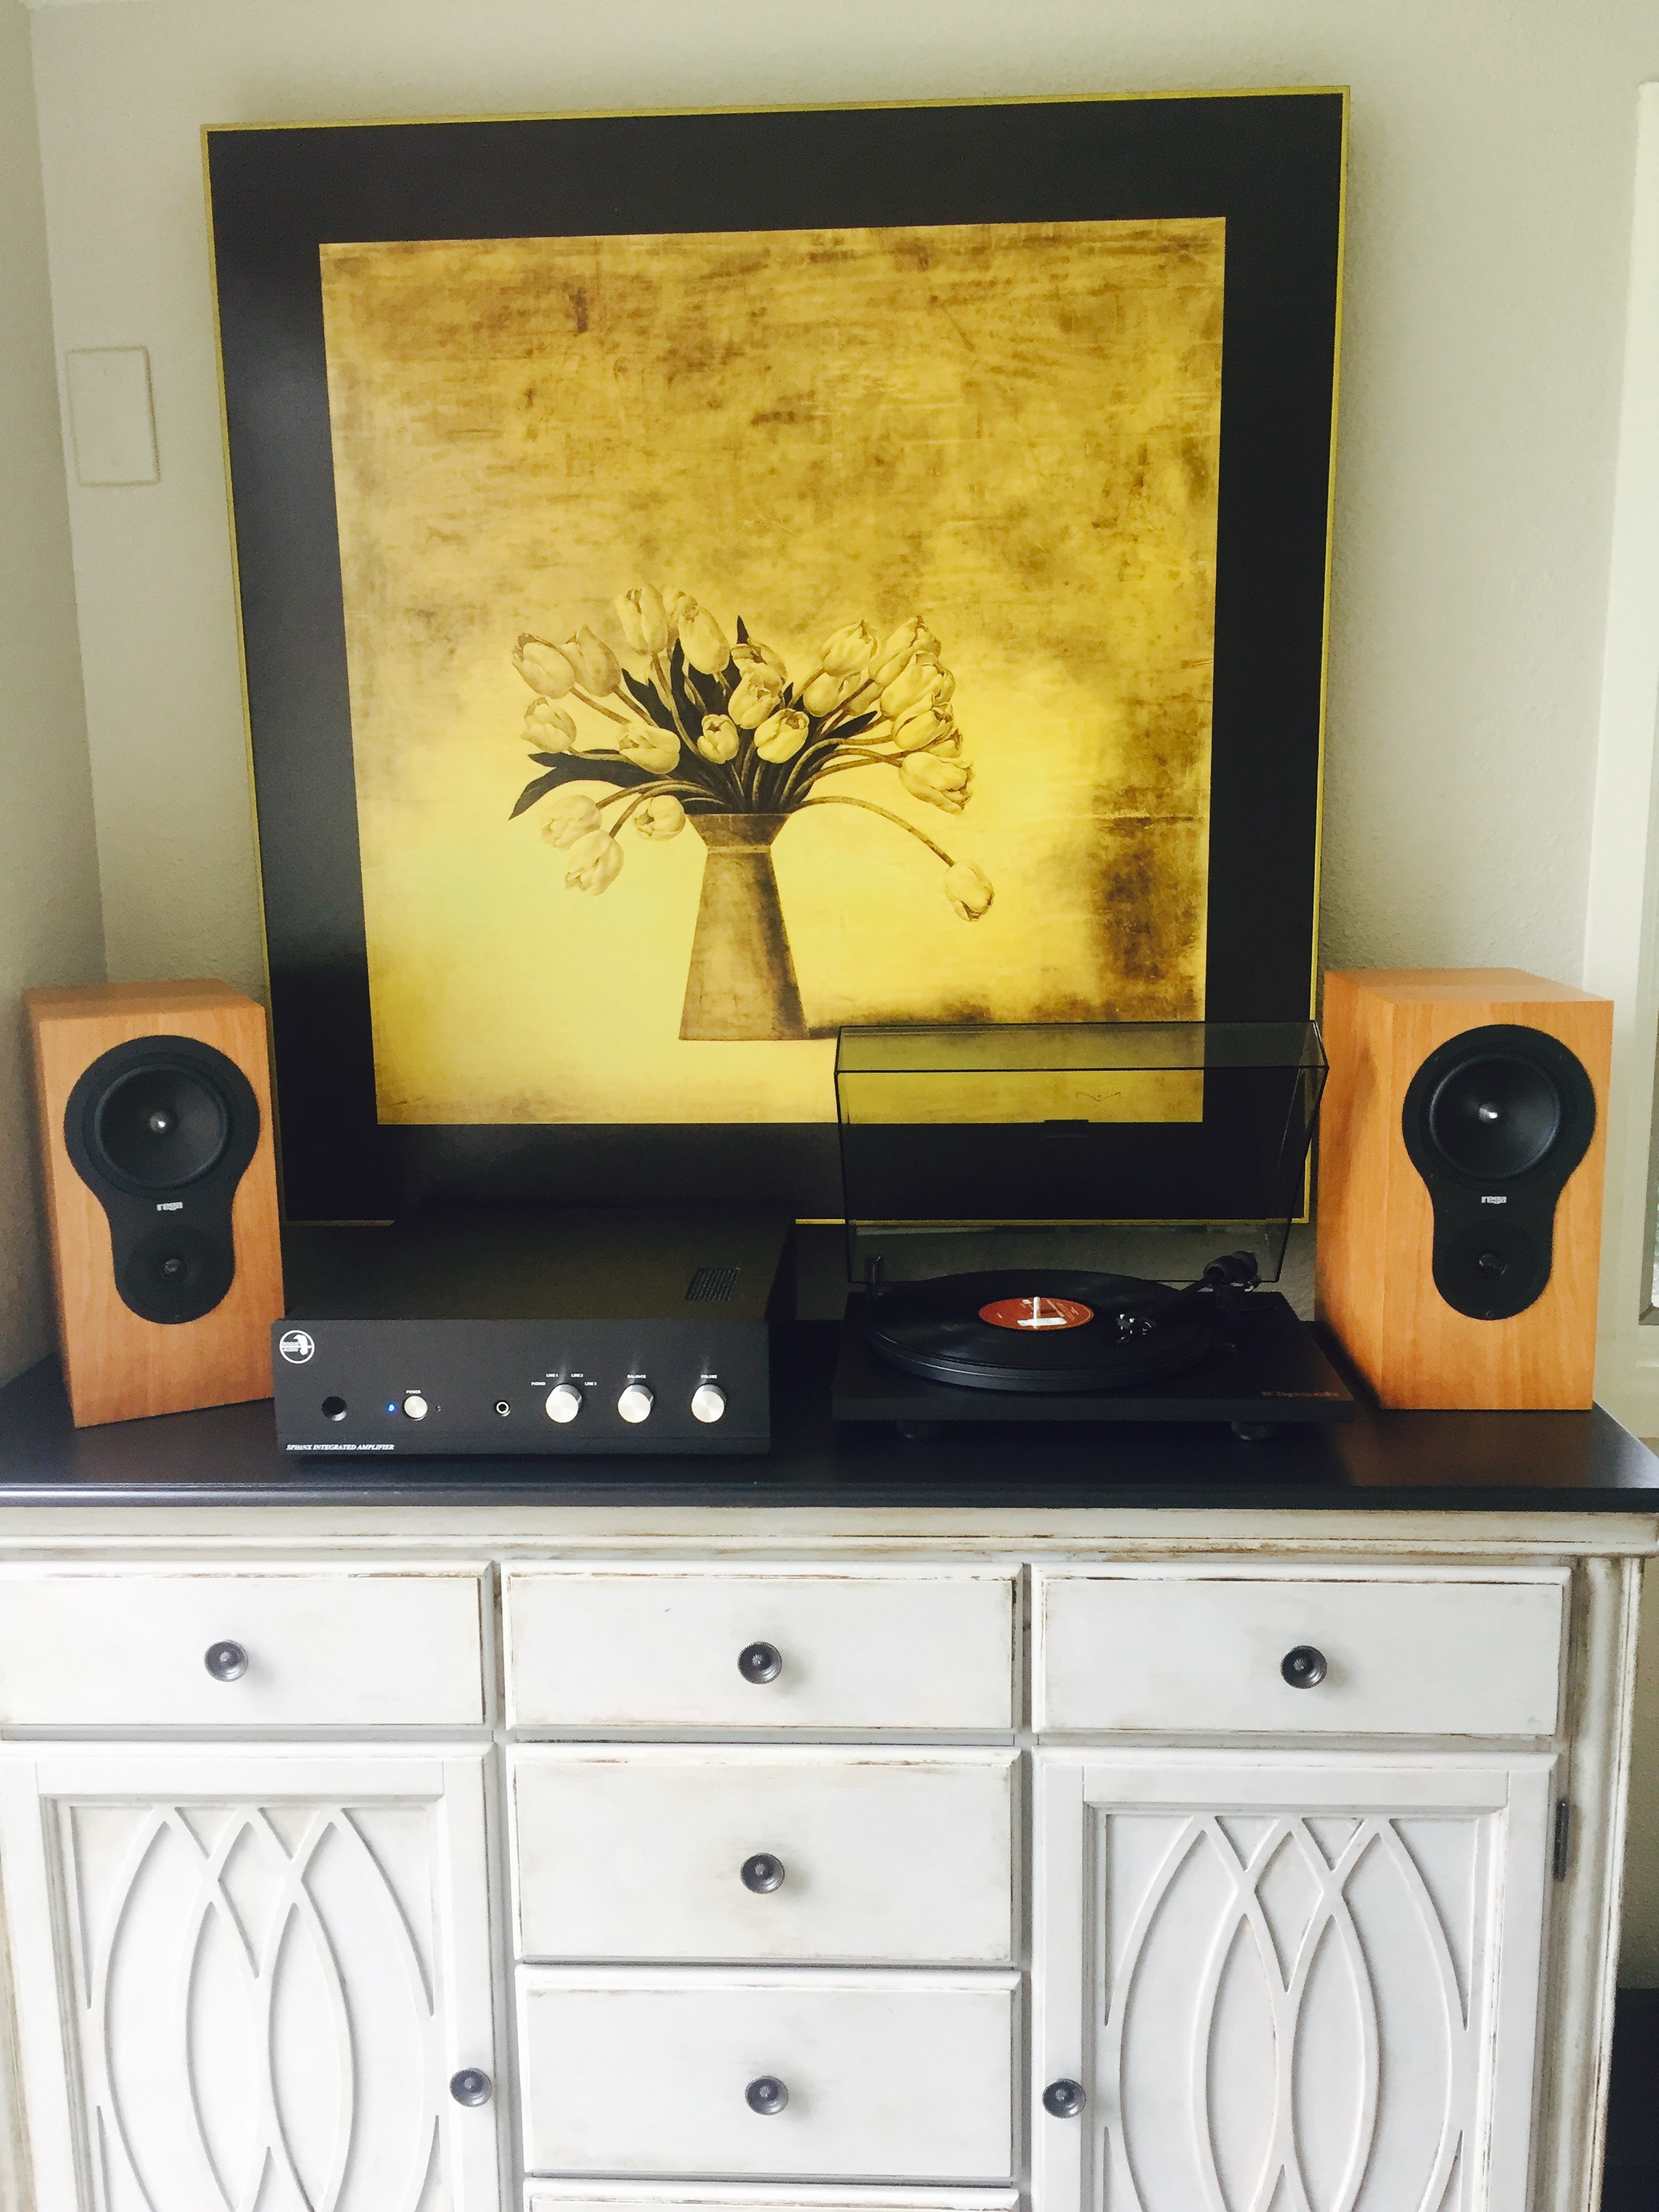 Aaron T System: Rogue Audio Sphinx integrated, Rega RX1 speakers, Project turntable. NICE!!